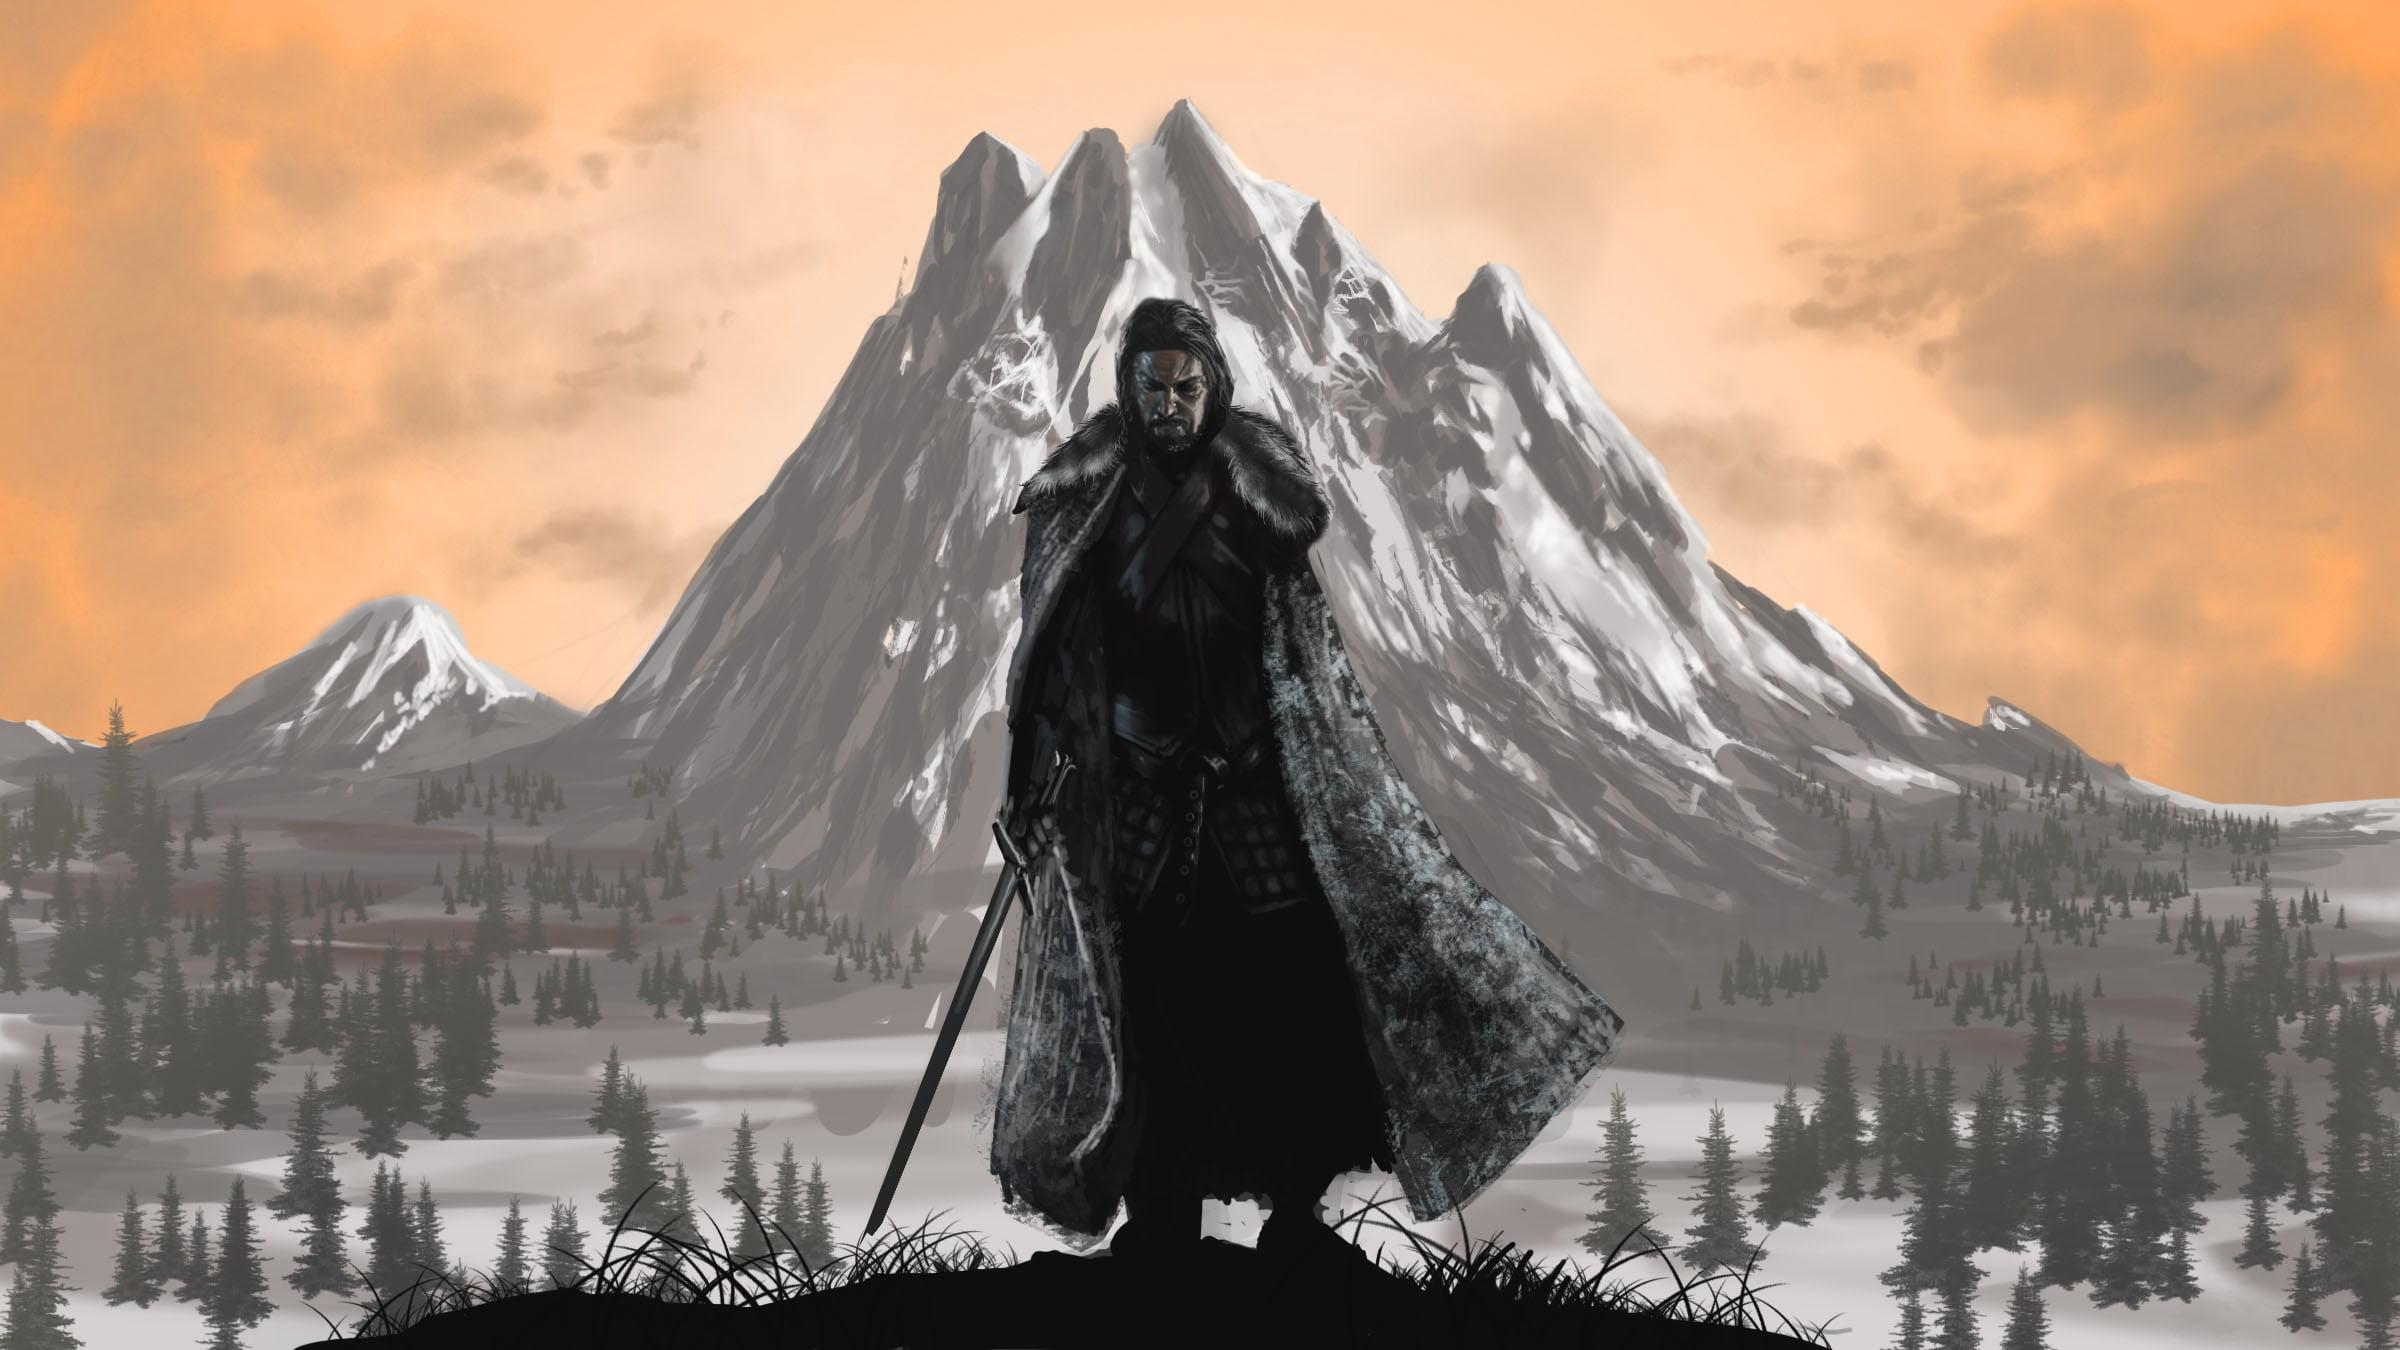 Game Of Thrones Iphone Wallpaper Hd Game Of Thrones Jon Snow Painting Game Of Thrones Benjen